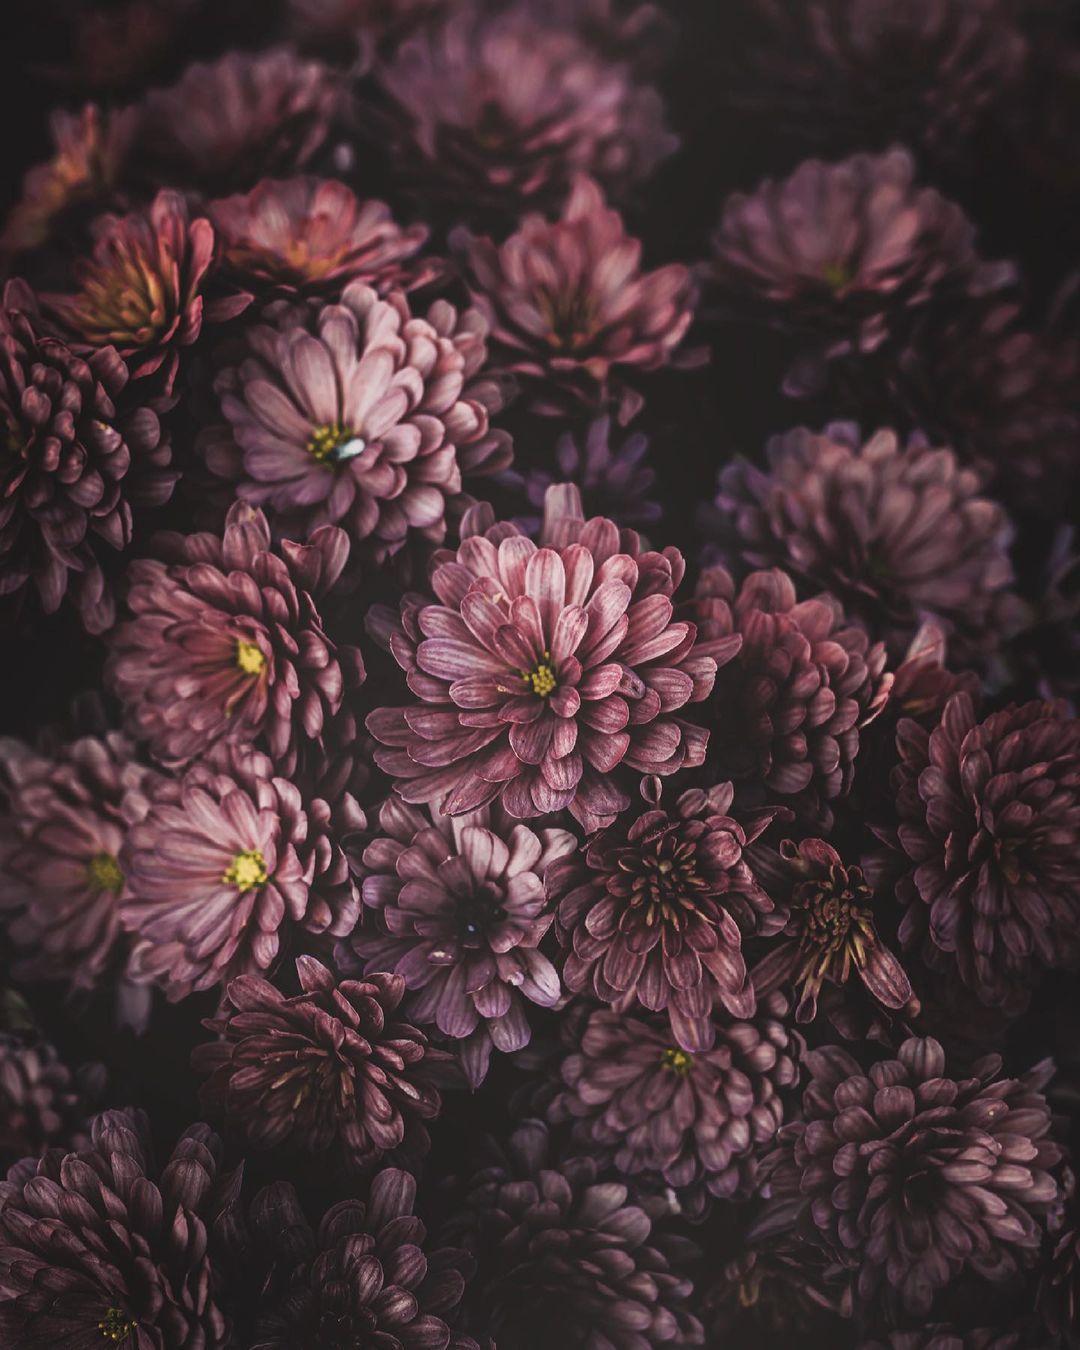 Красота цветов на снимках от Хико Такахаси